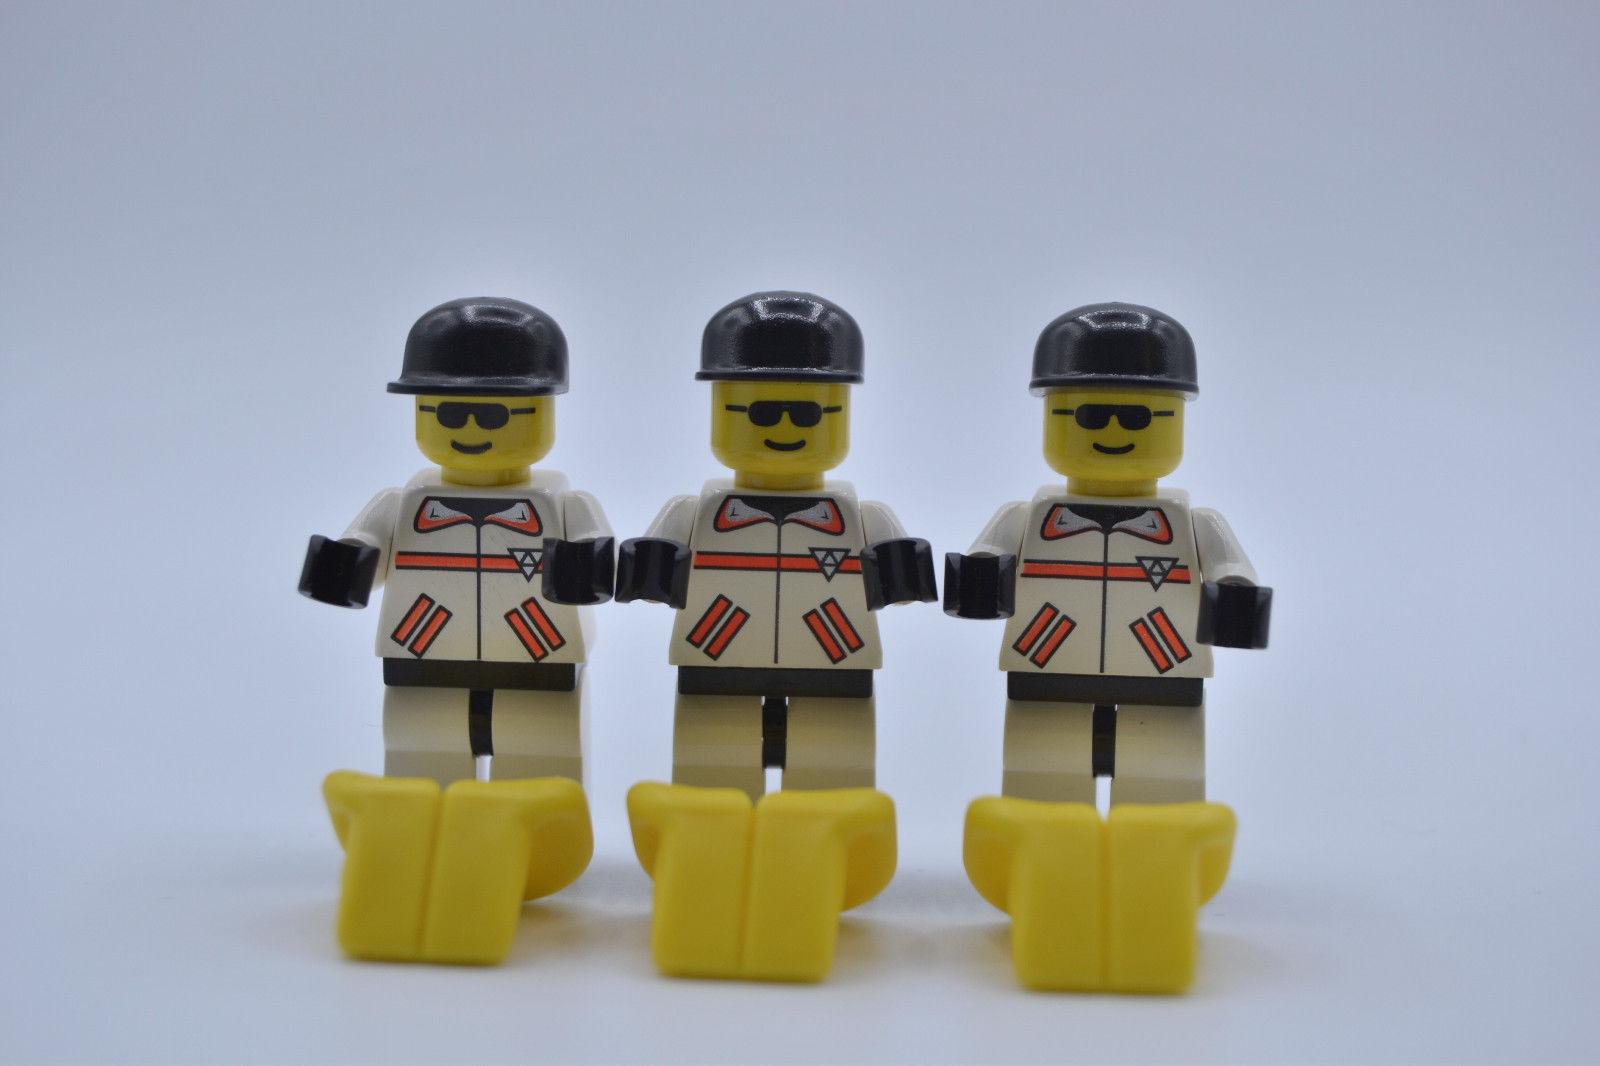 LEGO 3 x Figur Minifigur Res-Q 1 Cap schwarz Weste gelb rsq003 aus Set 6479 6451